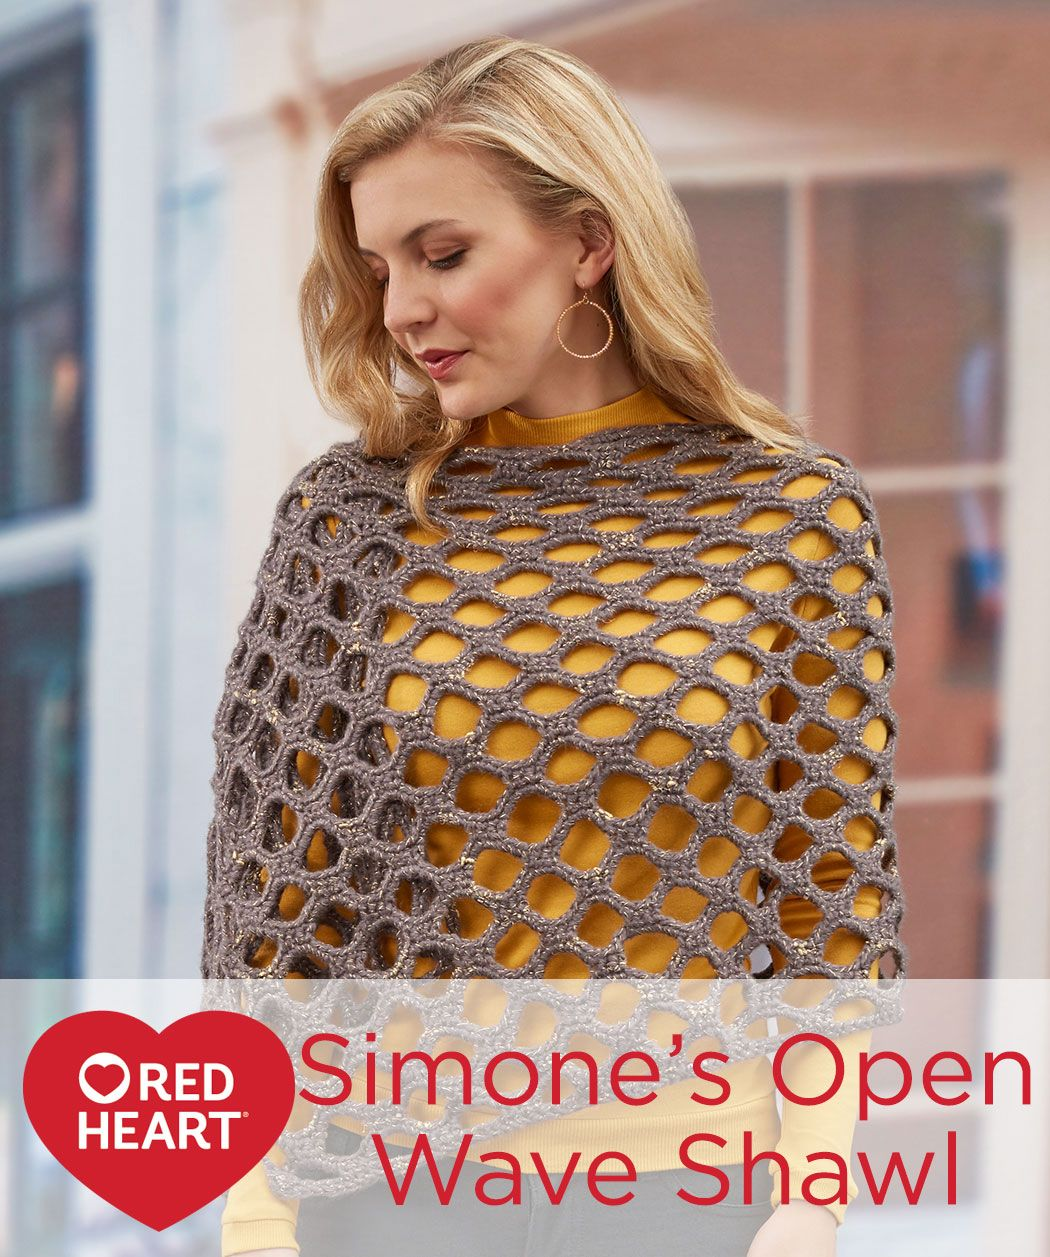 Simone\'s Open Wave Shawl Free Crochet Pattern in Red Heart Gleam ya ...